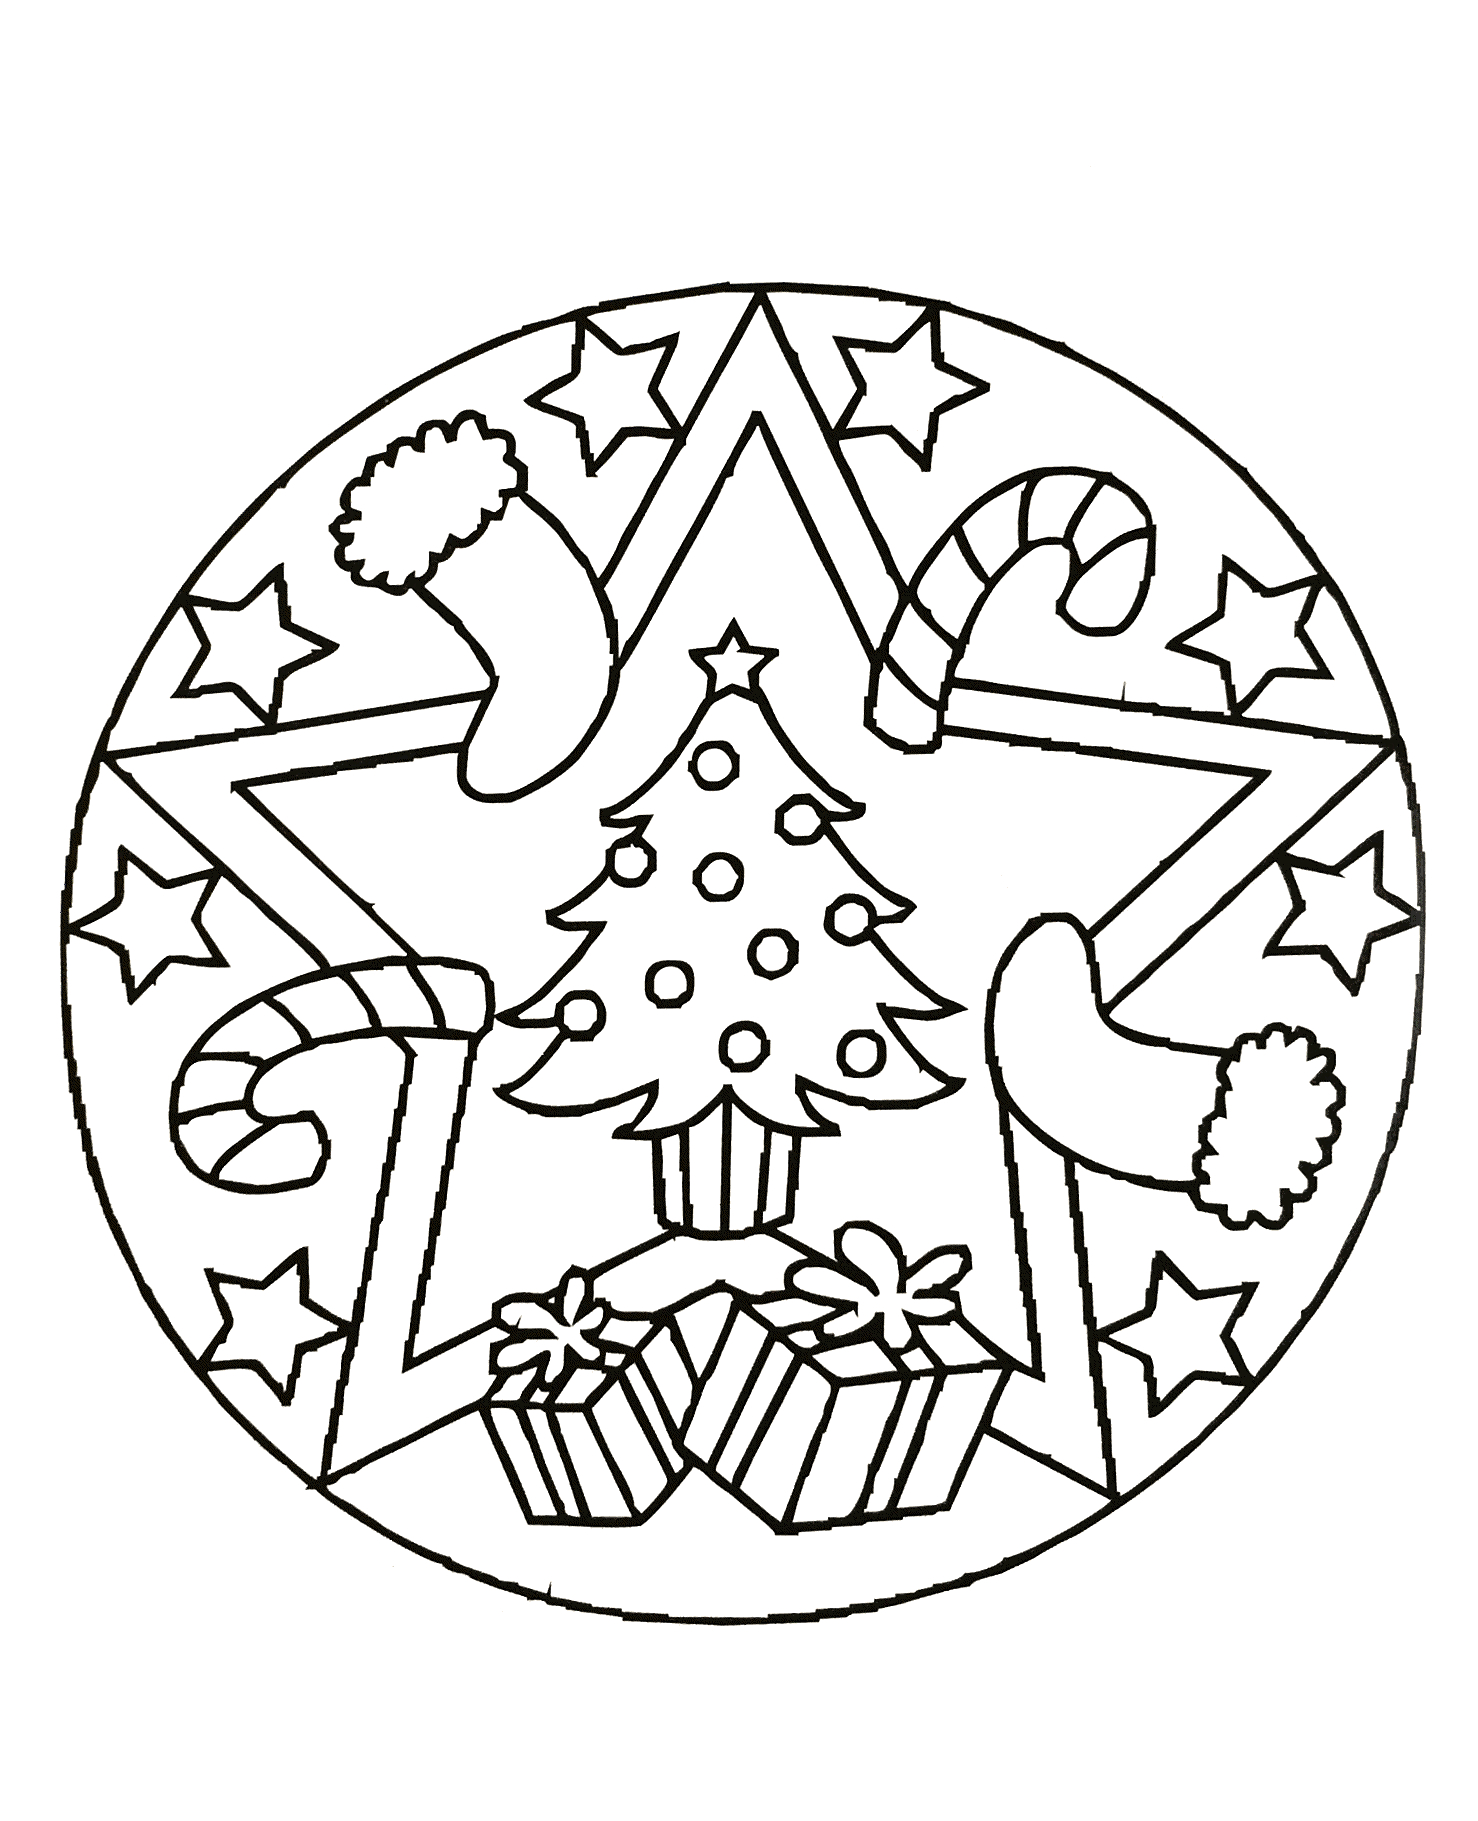 Mandalas A Imprimer Gratuit 68 - Mandalas De Difficulté à Mandala Facile À Imprimer